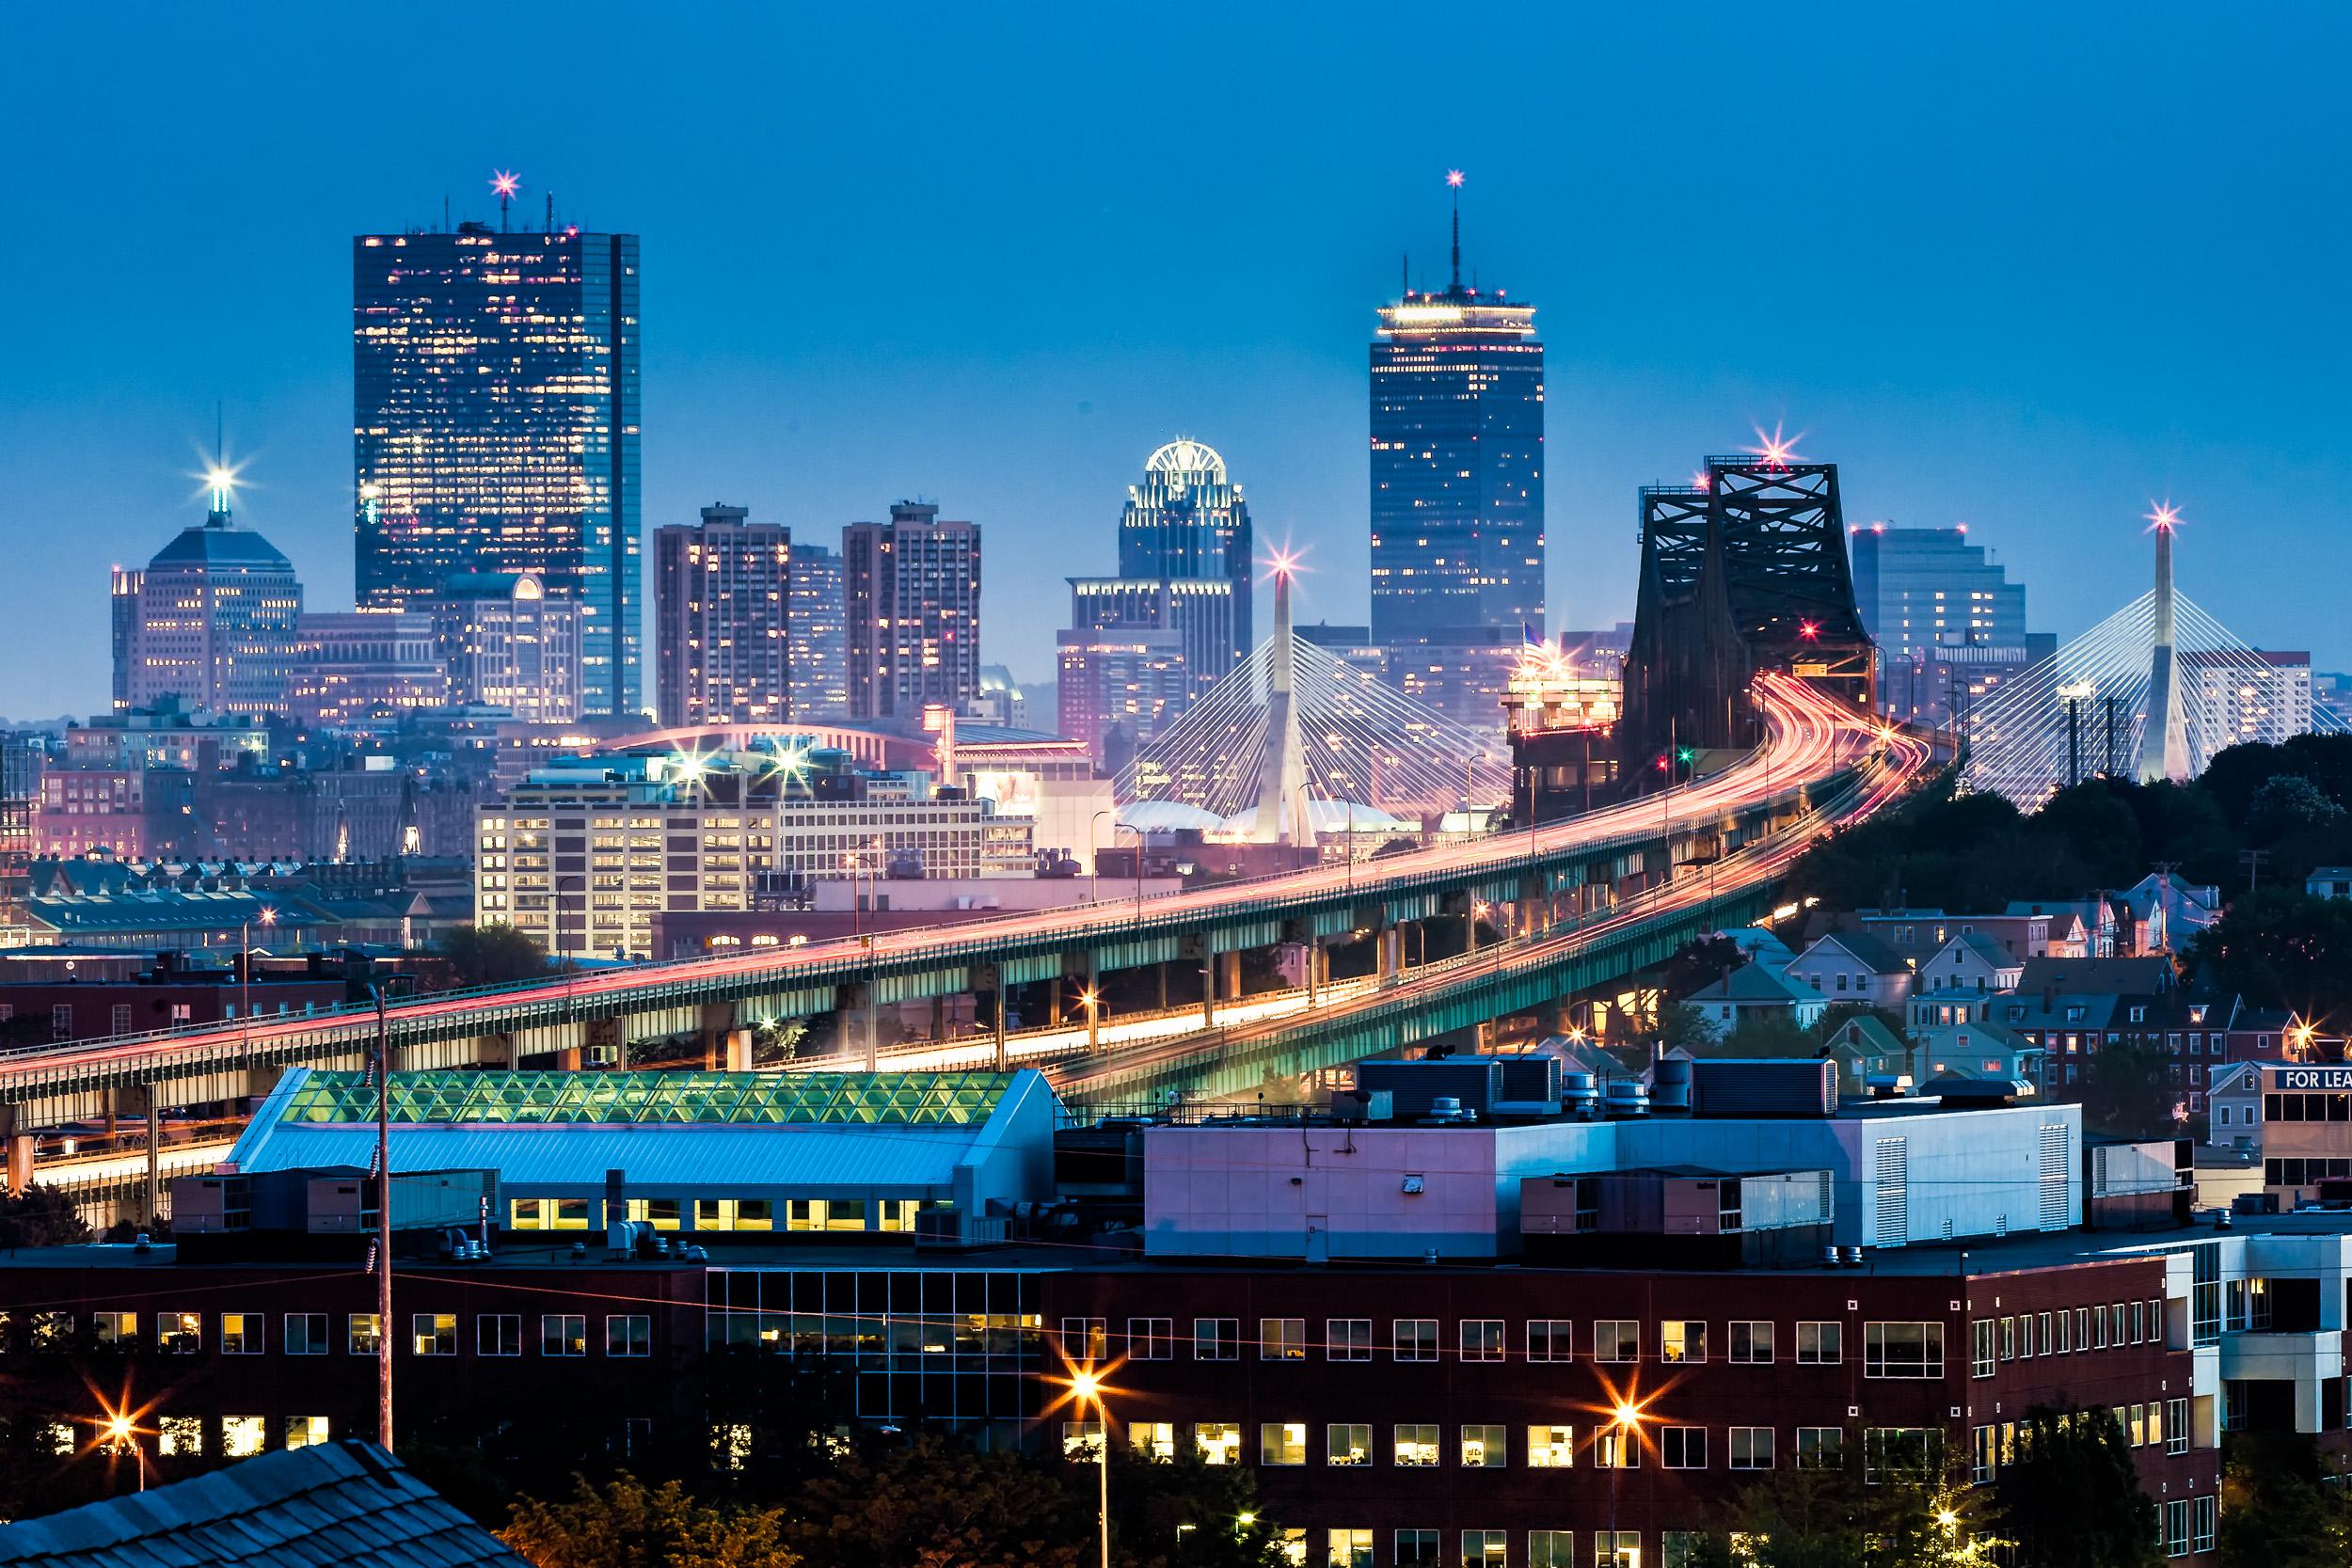 Boston_from_Chelsea_Miami_Fort_Lauderdale_commercial_photographer_Franklin_Castillo.jpg